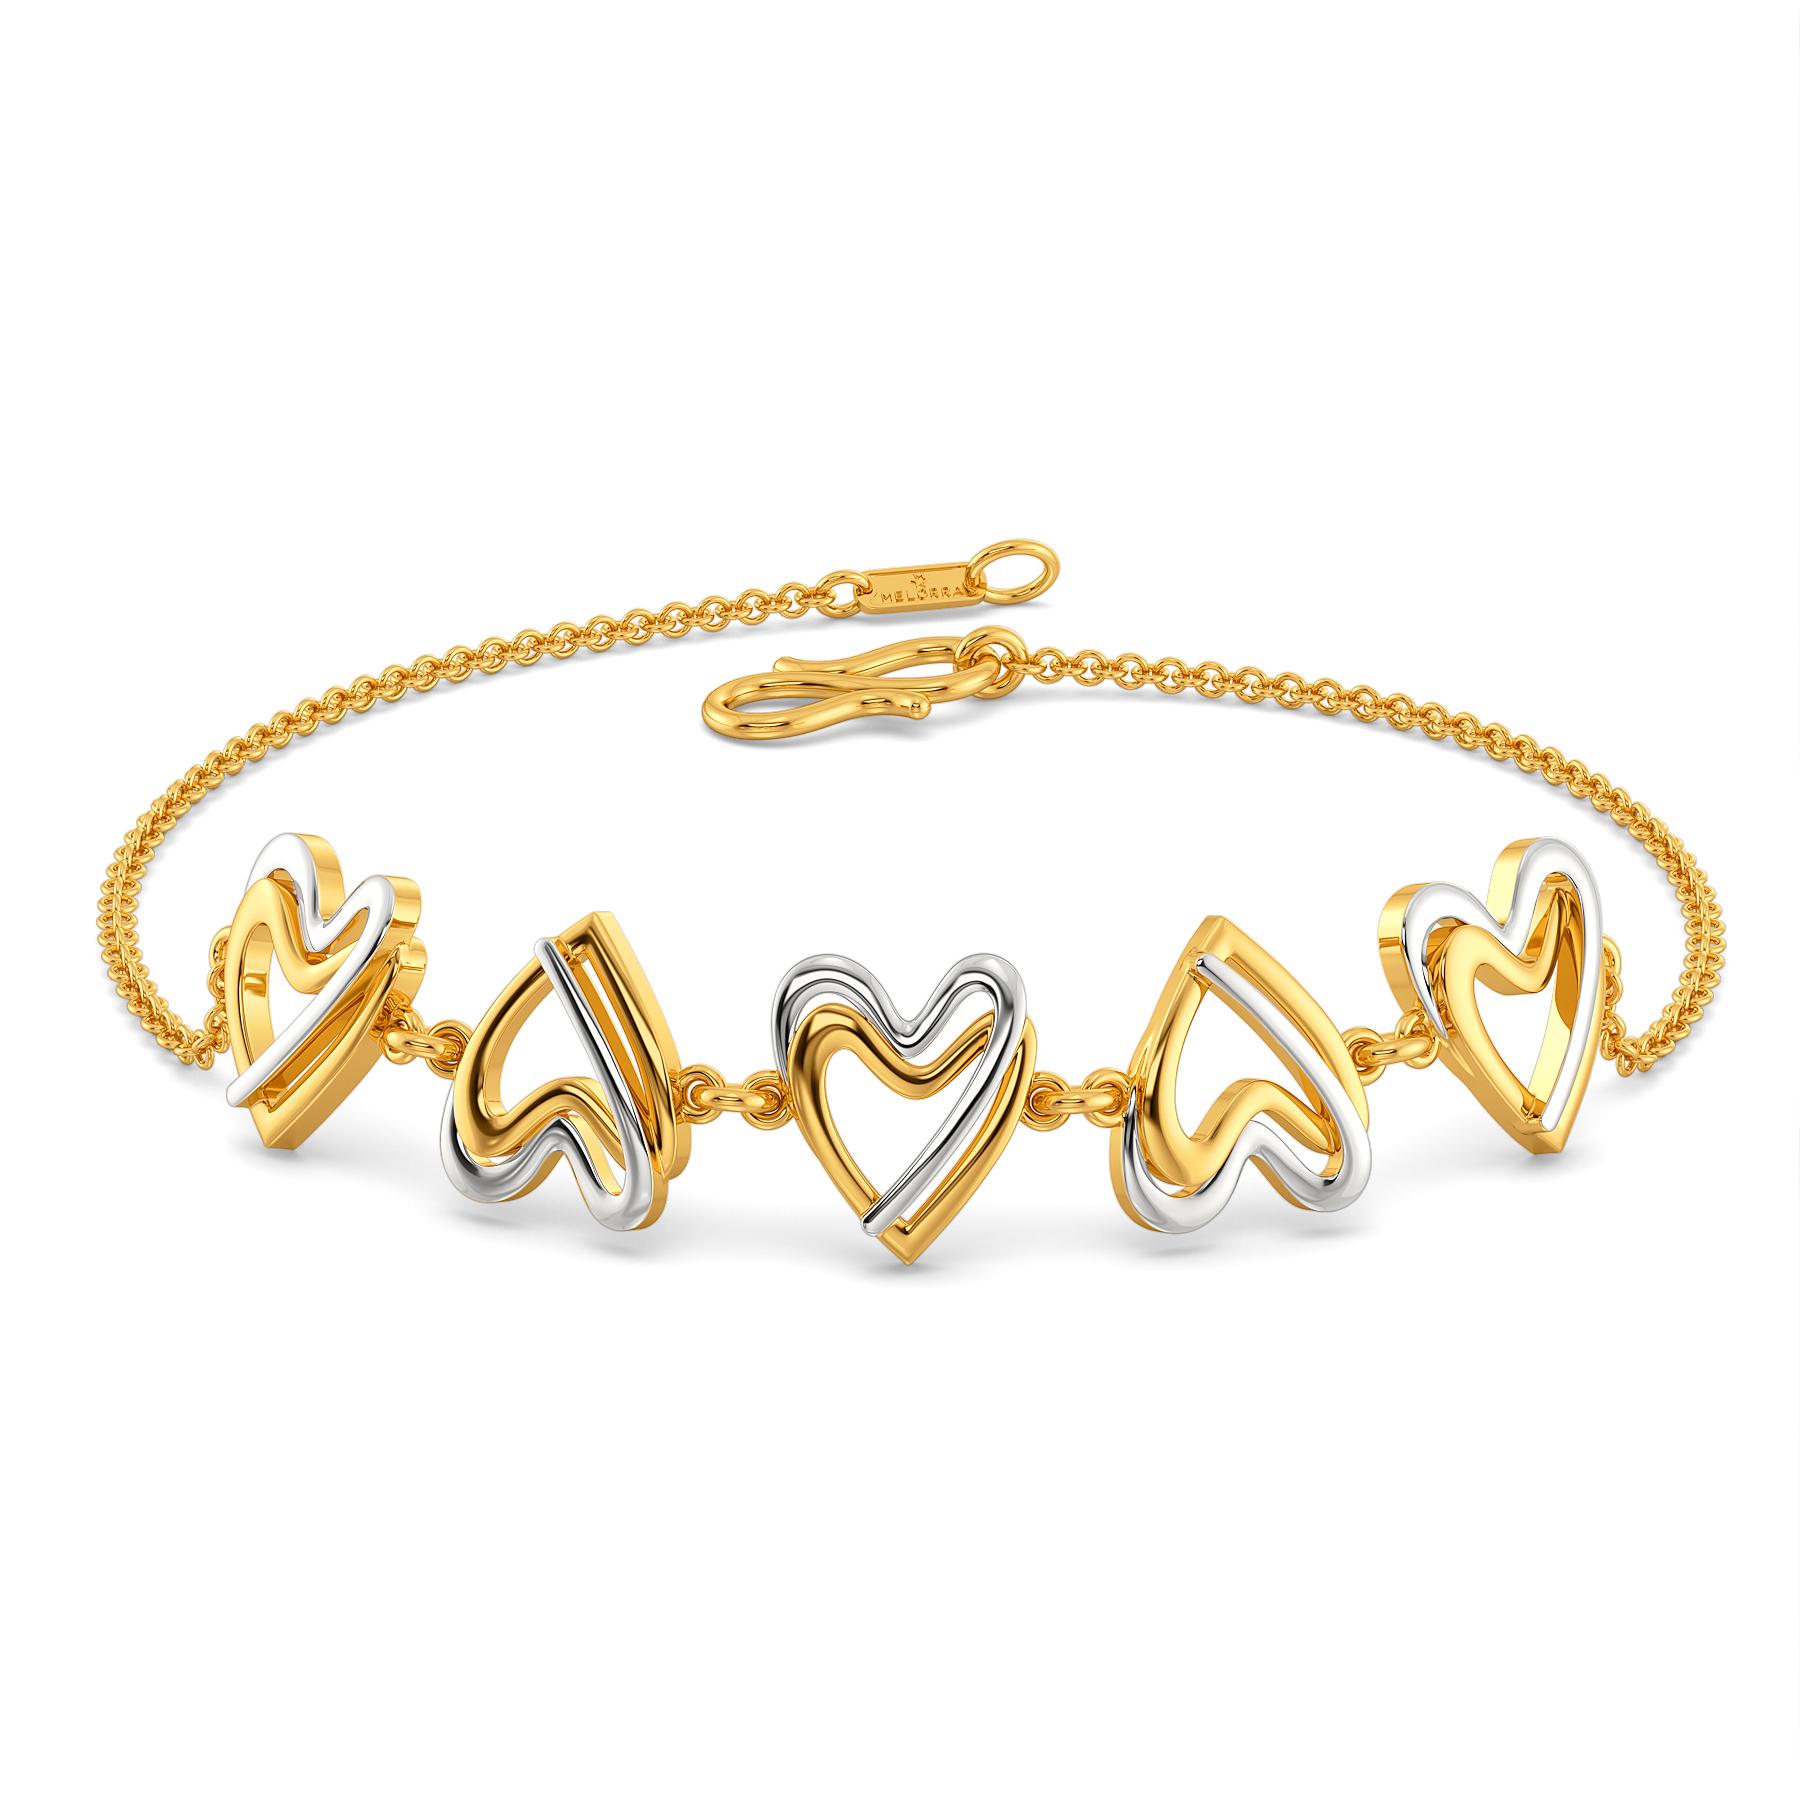 Double Dealing Gold Bracelets